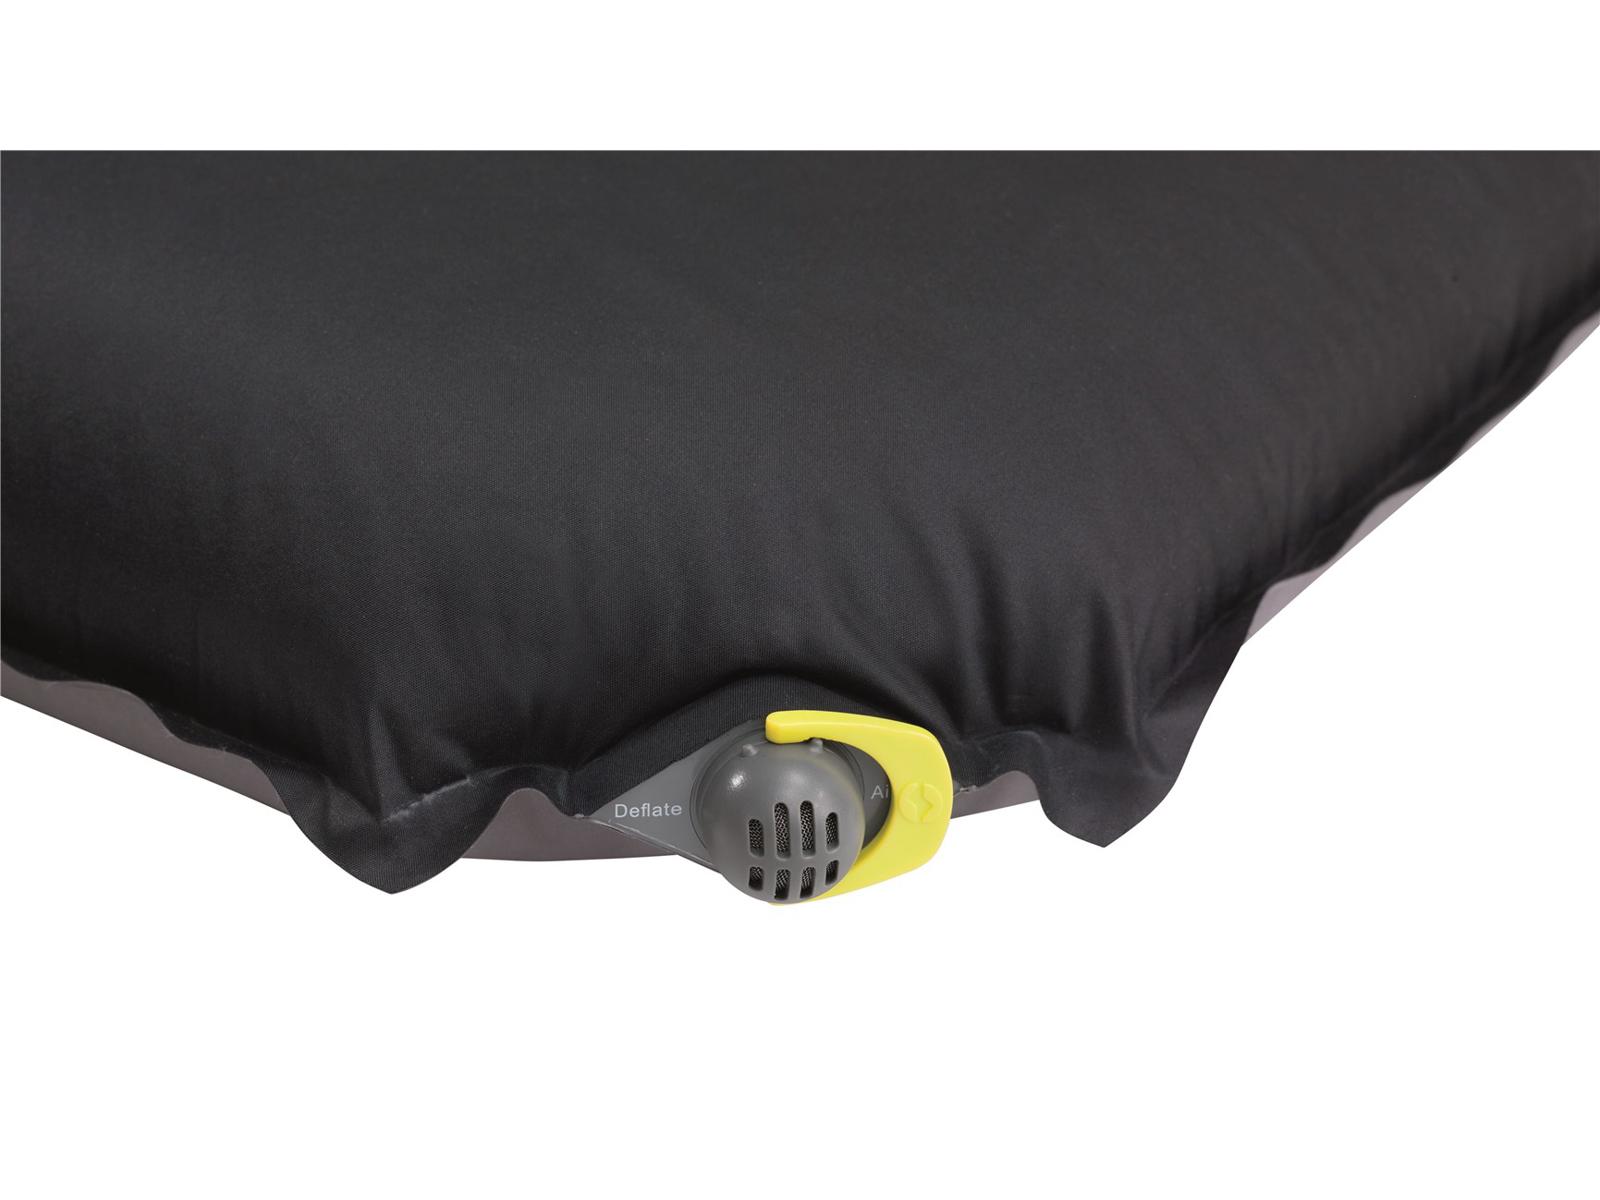 Outwell Sleepin Single 3.0 cm - Selvoppustelig madras